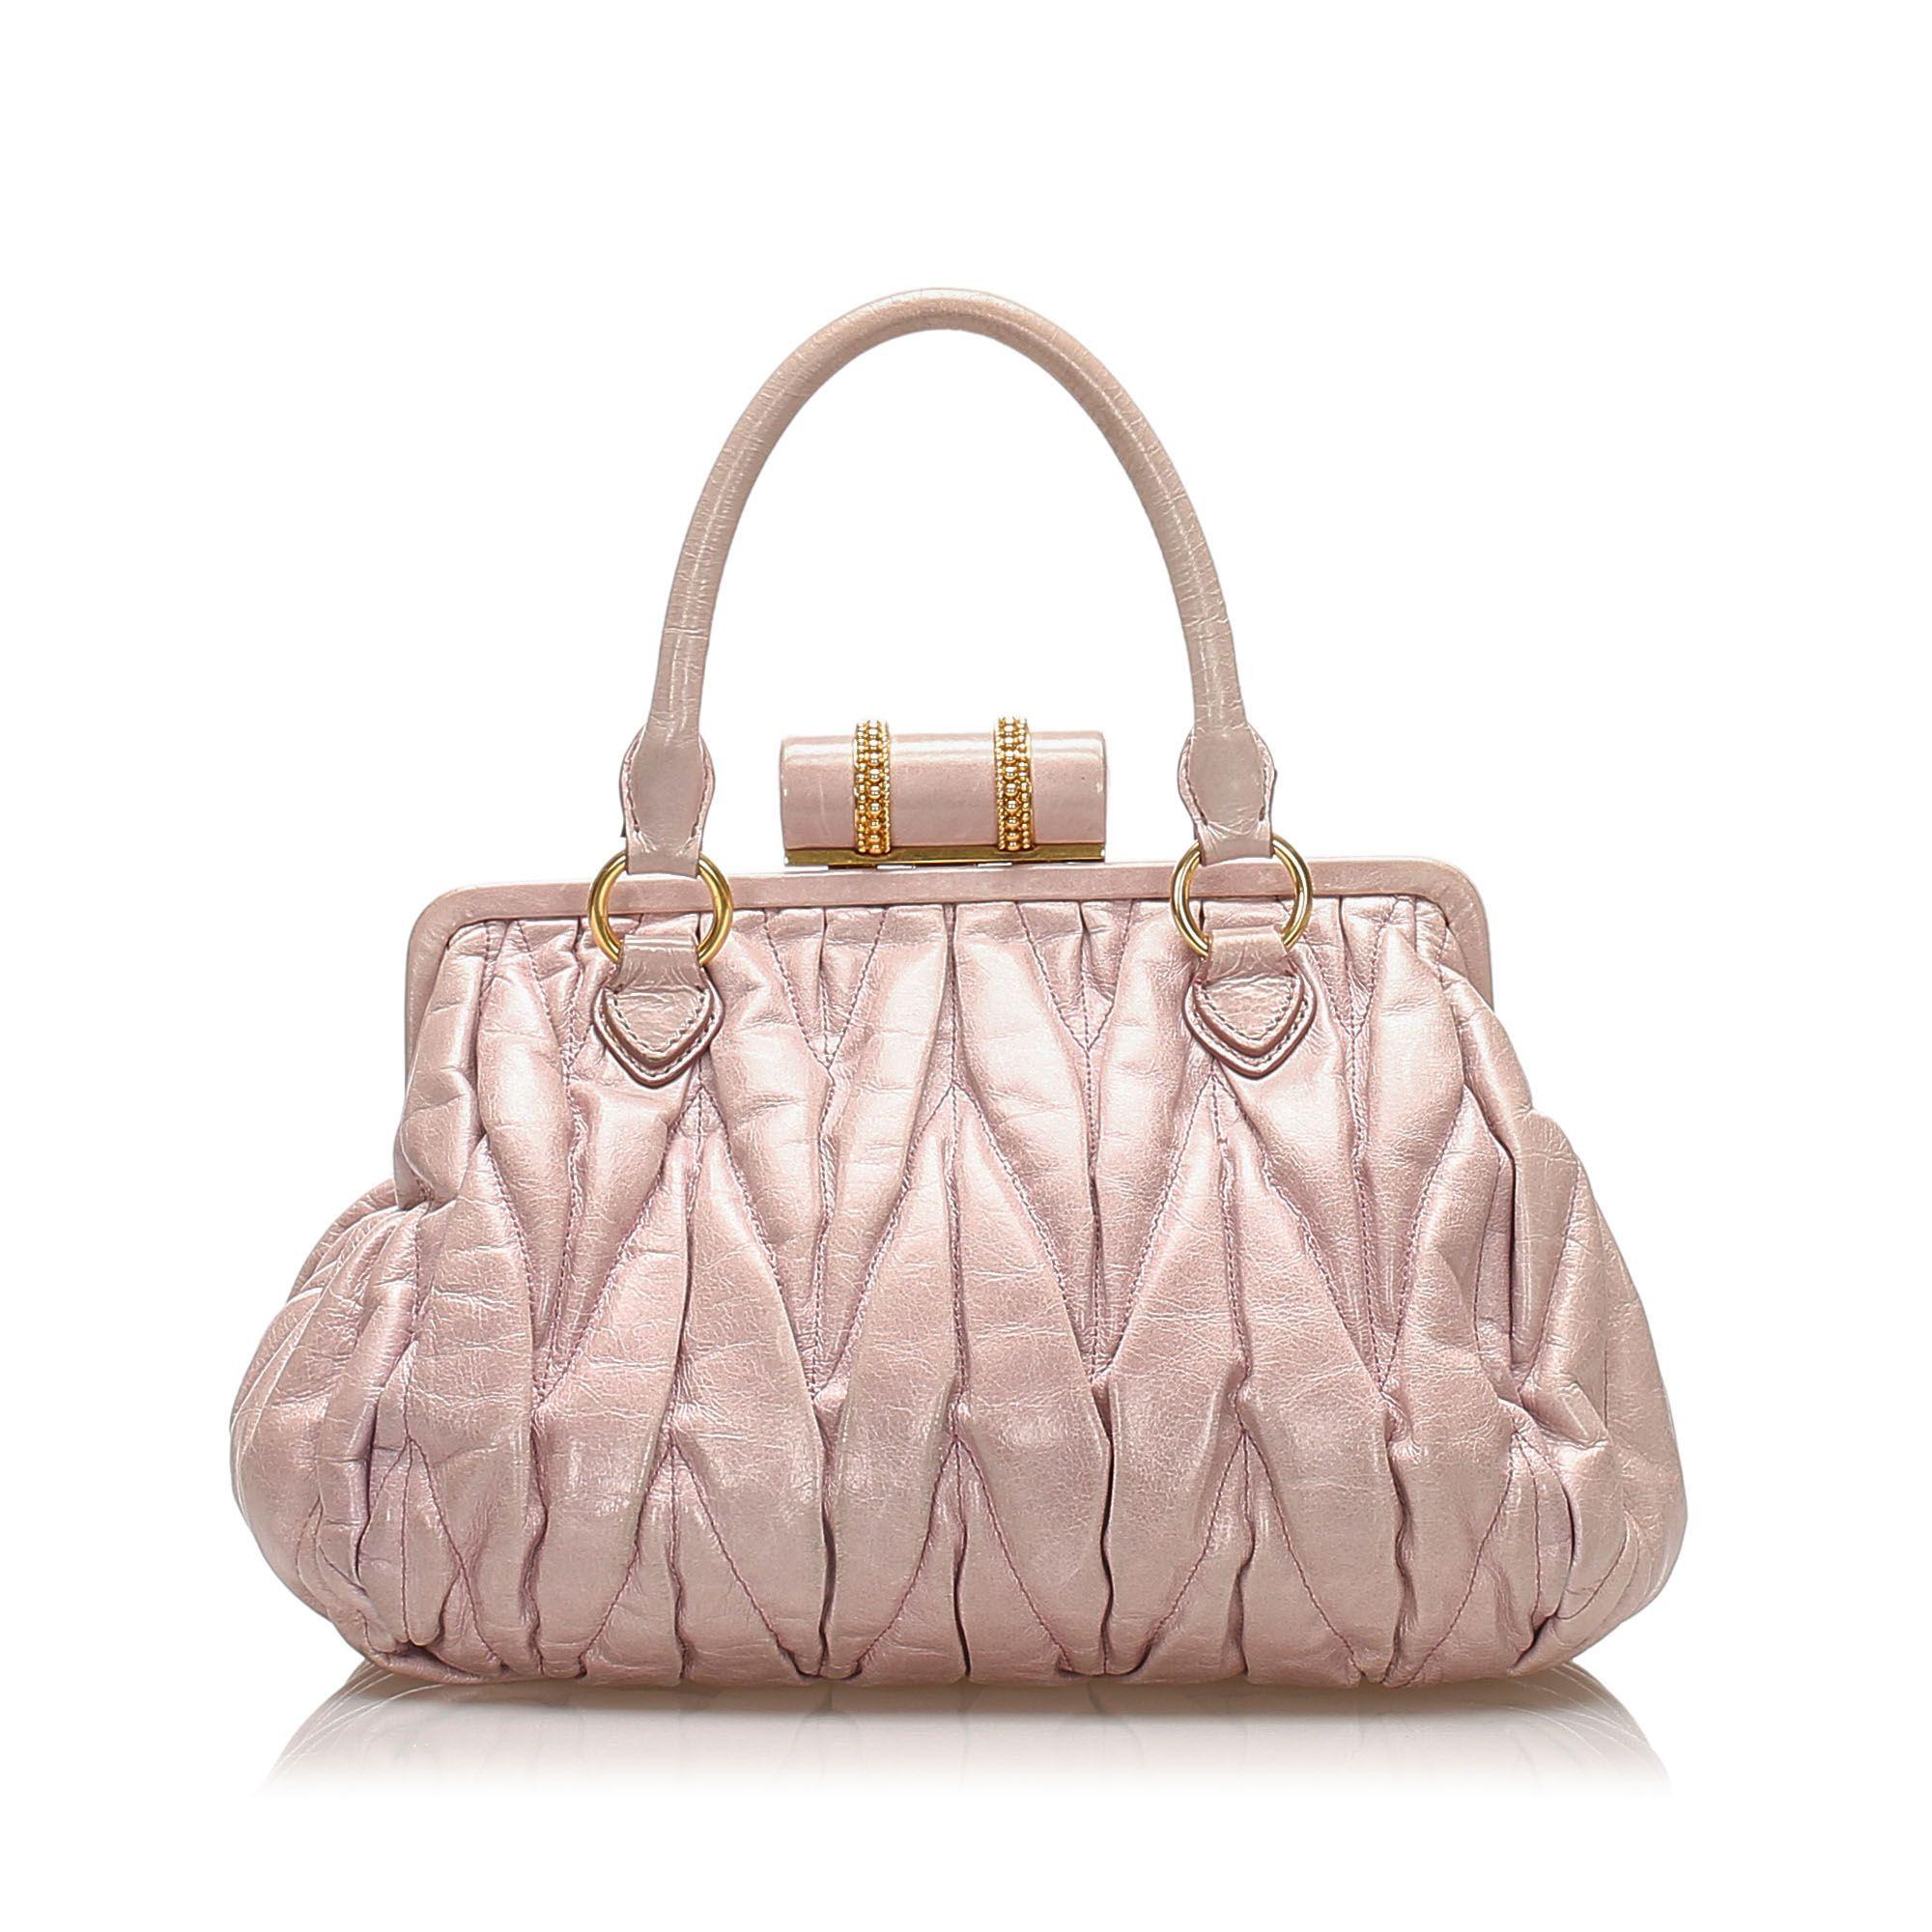 Vintage Miu Miu Coffer Leather Handbag Pink